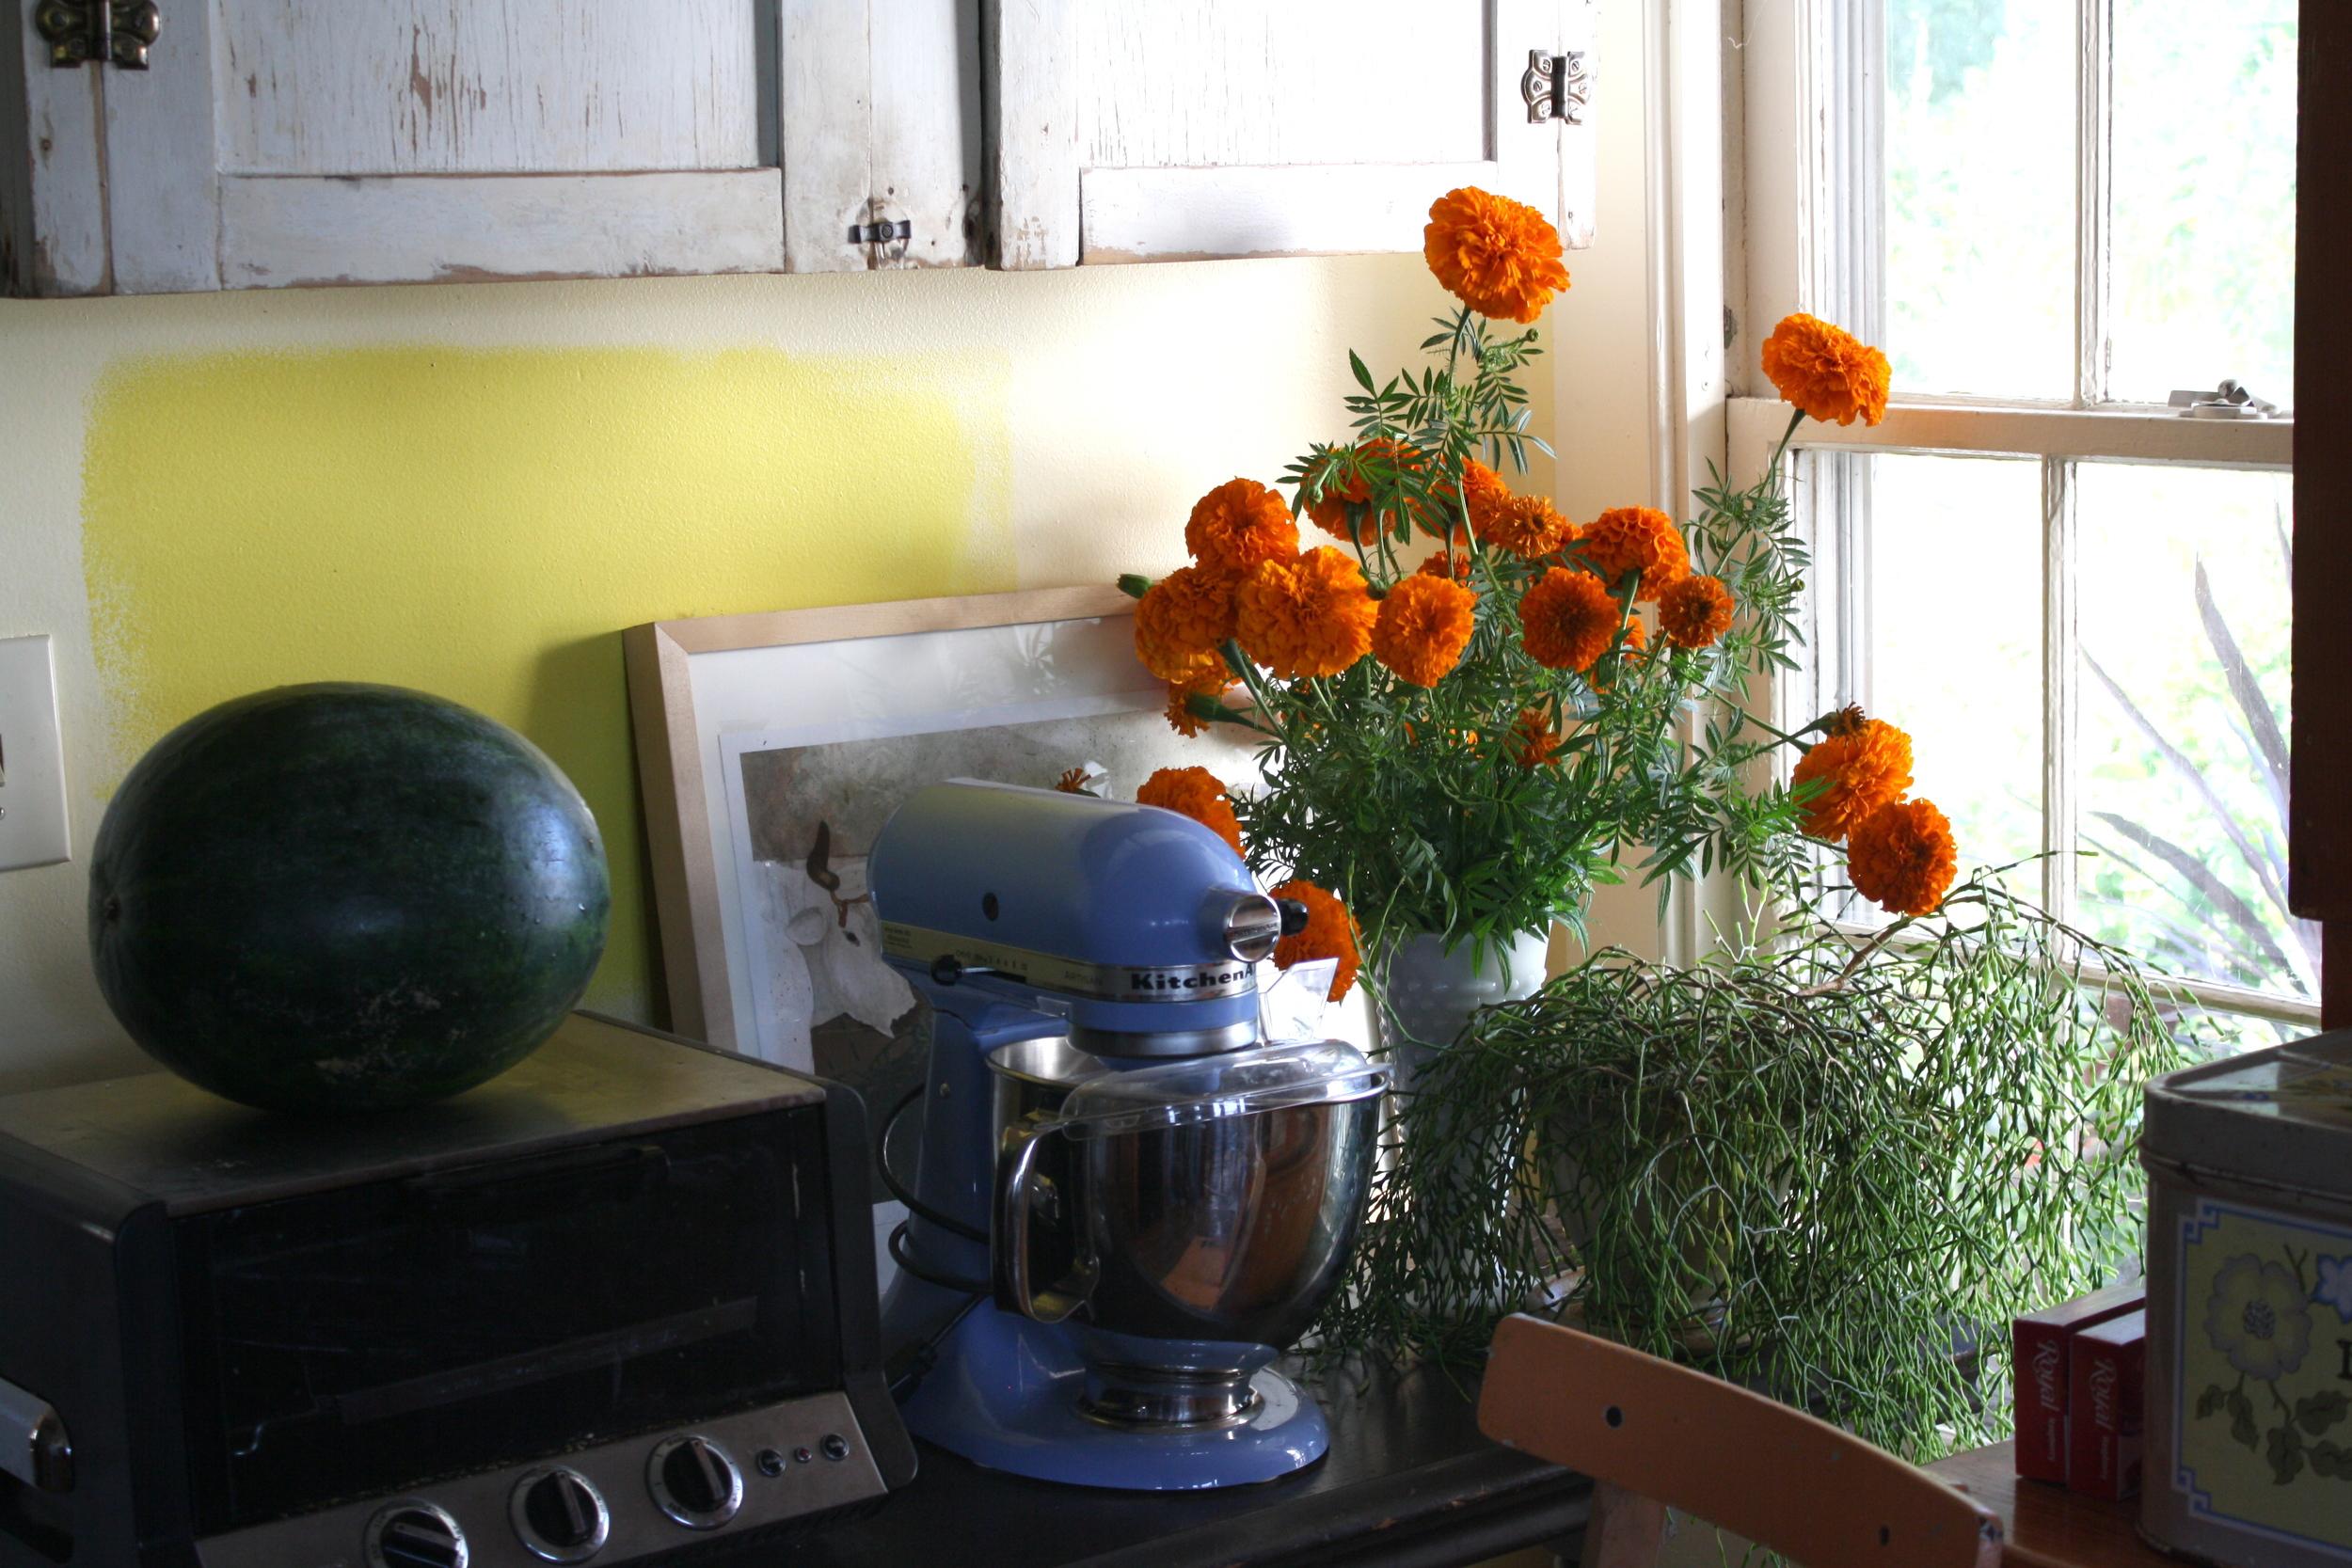 Now in vase